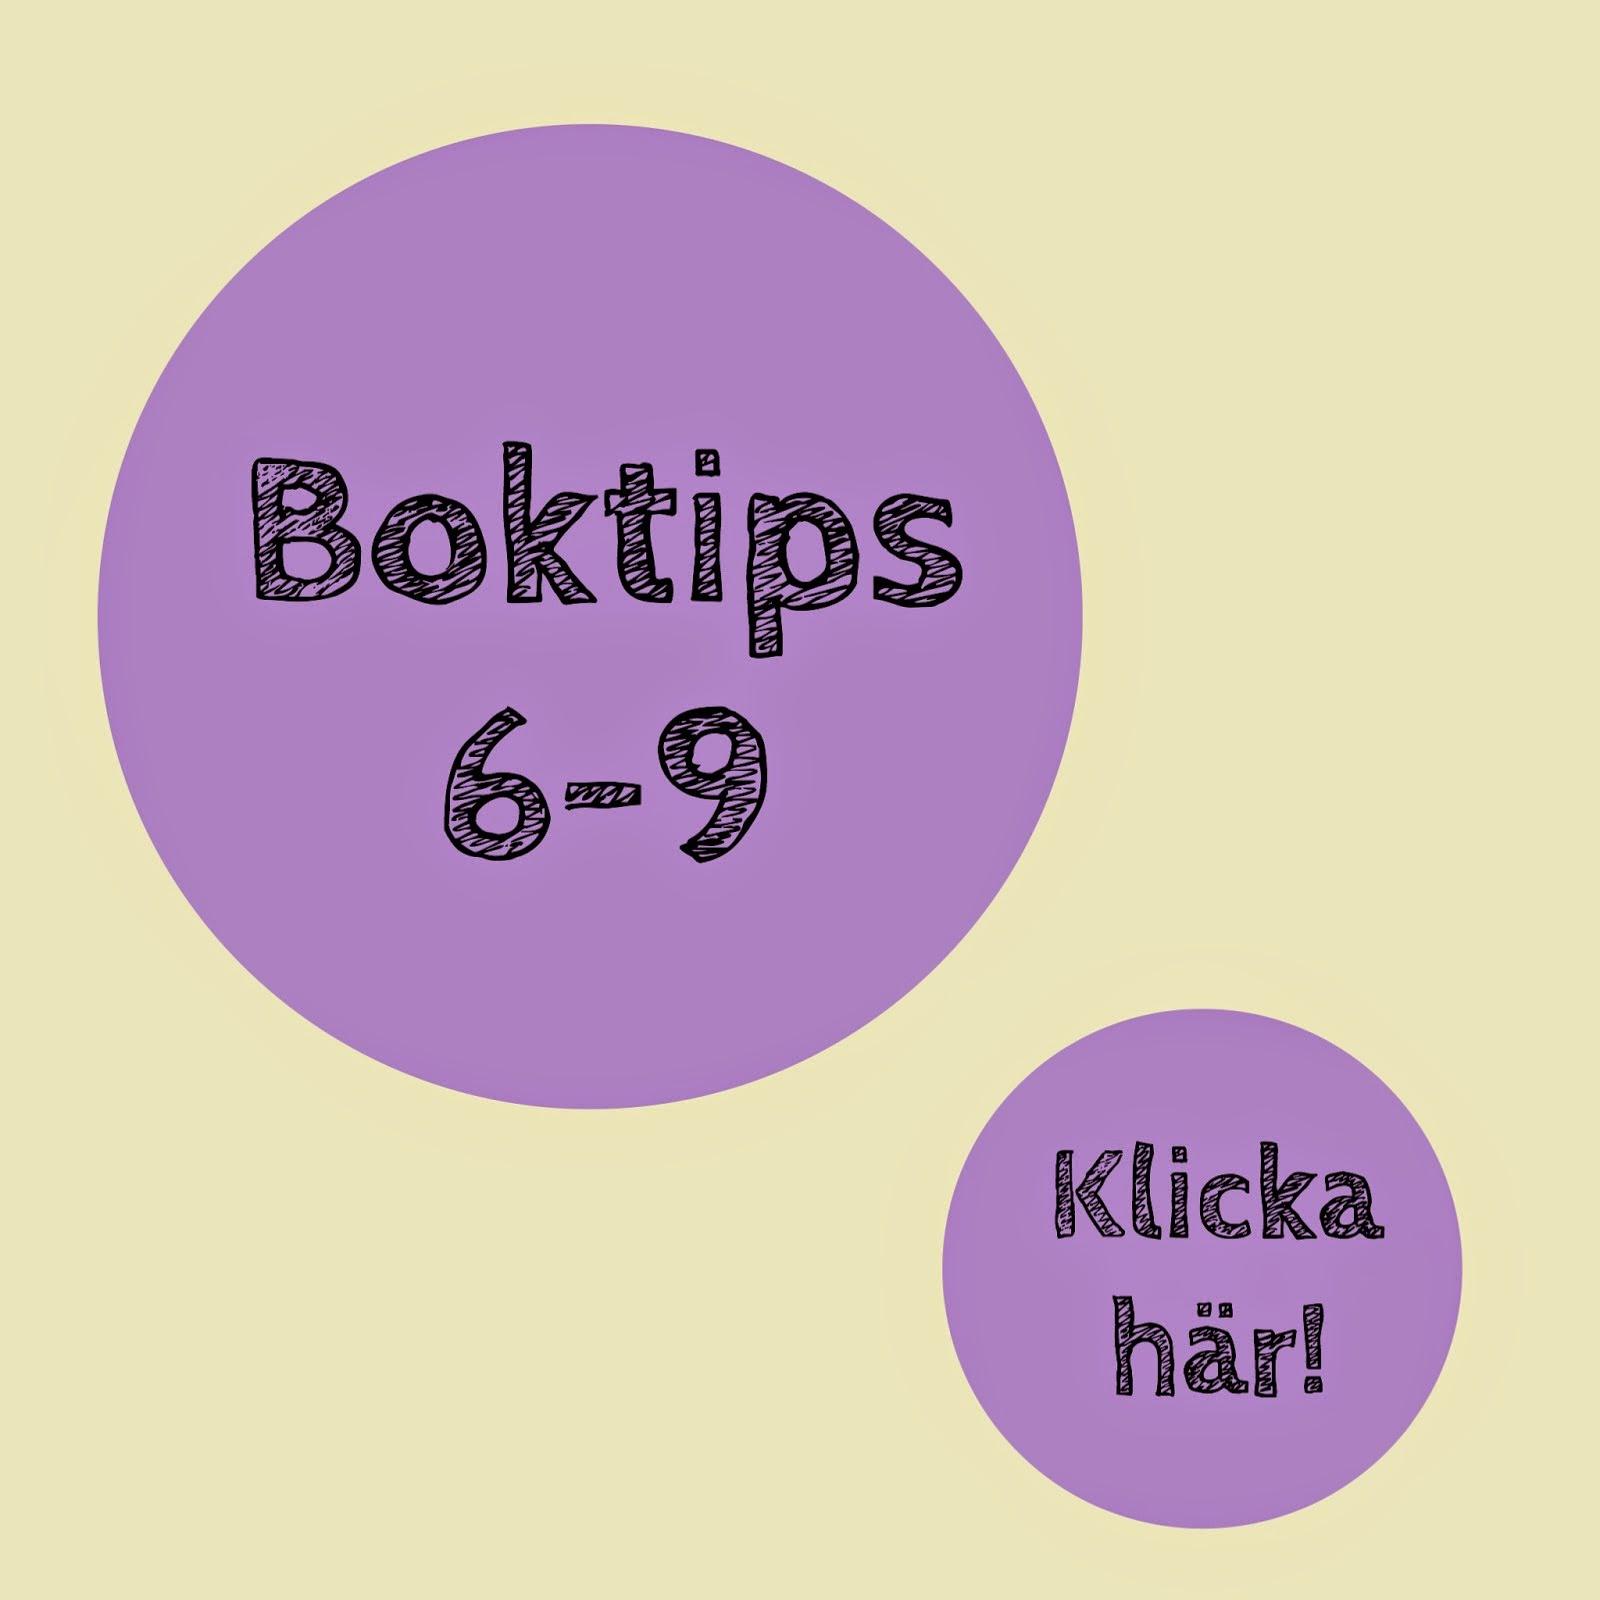 Boktips 6-9